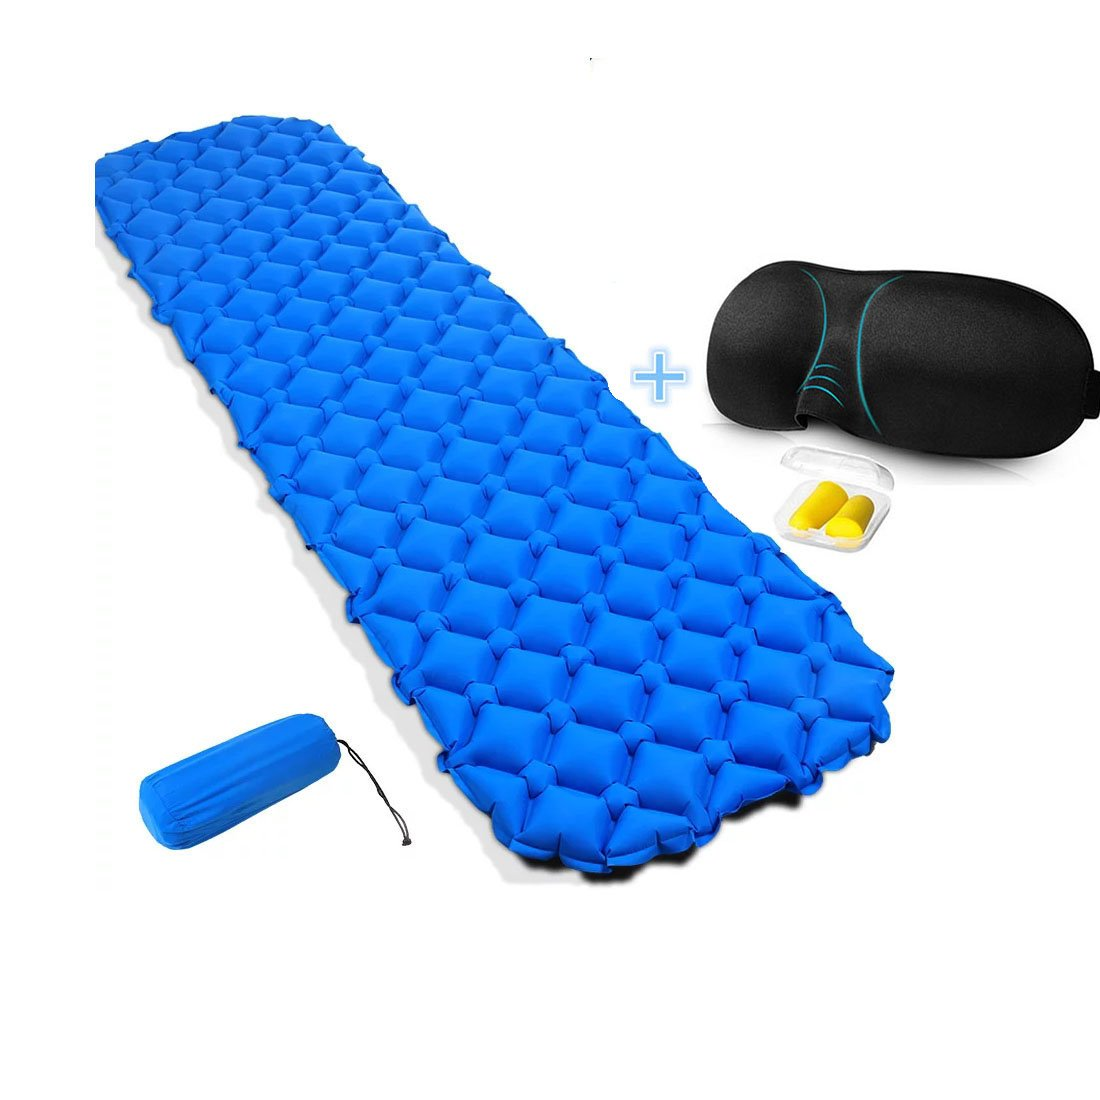 Ultralight Foam Camping Mat Folding Beach Tent Sleeping Pad Waterproof Mattre YH